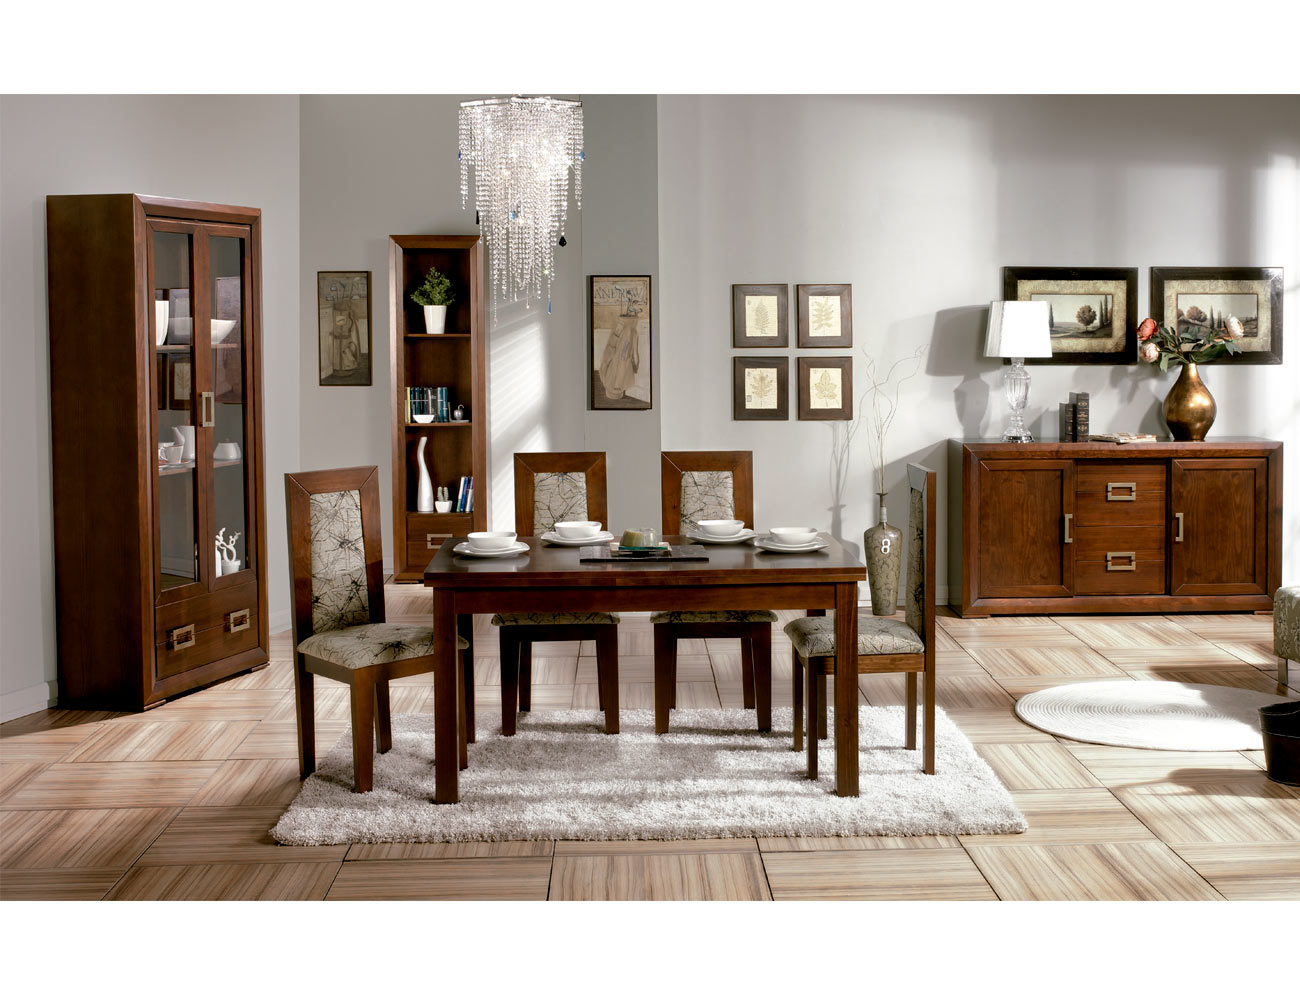 Composicion34 mueble salon comedor madera9